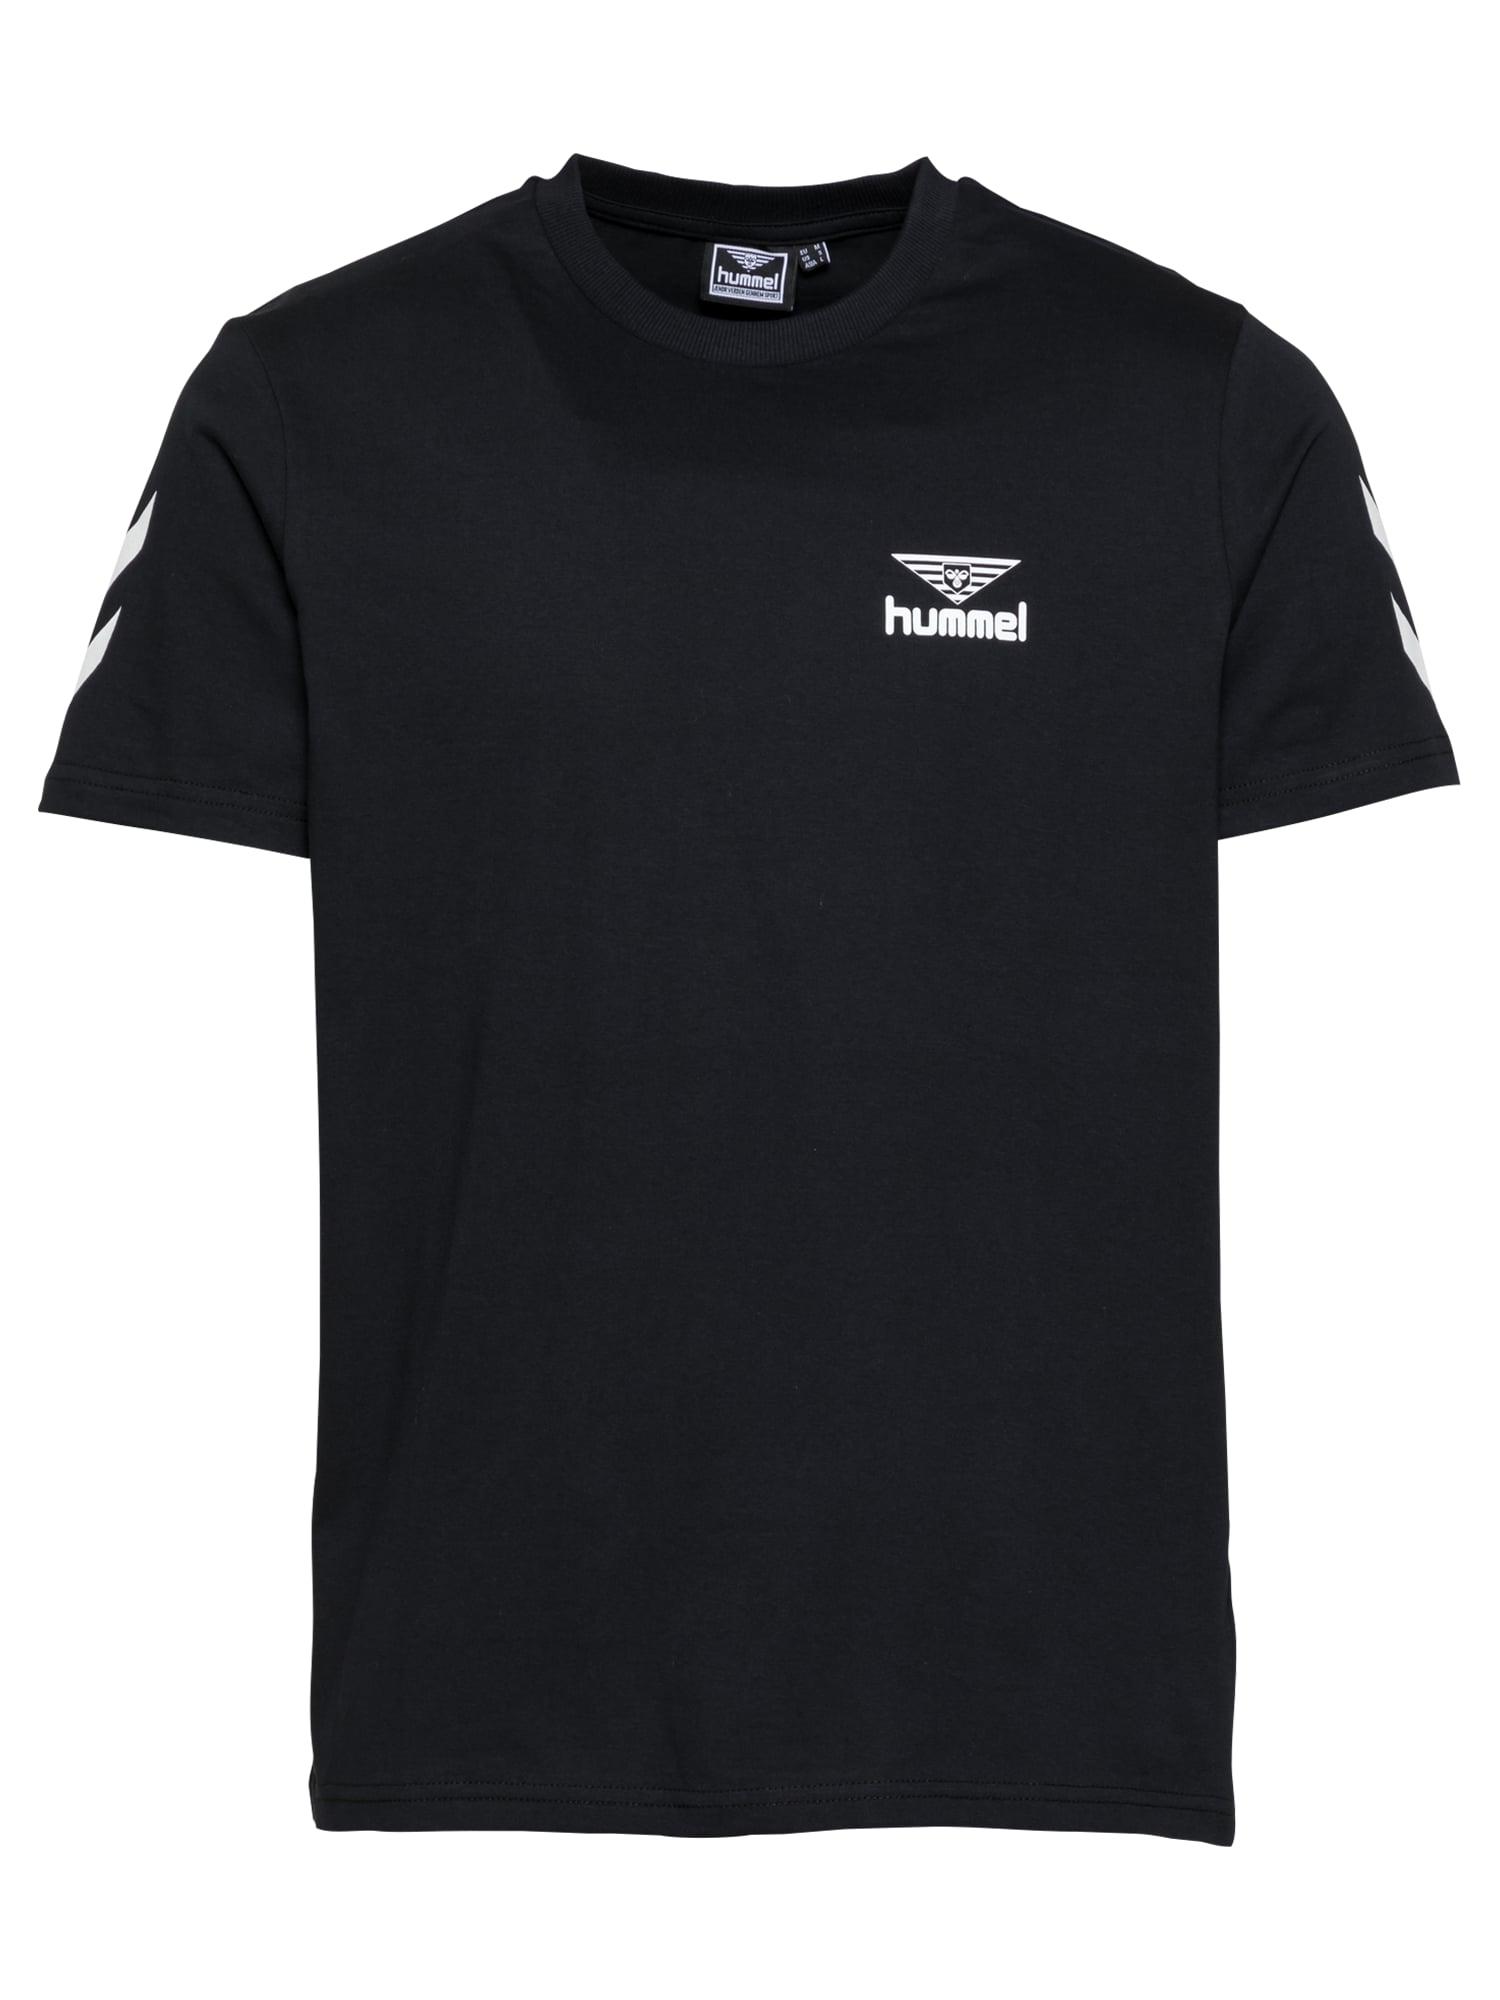 hummel hive Marškinėliai juoda / balta